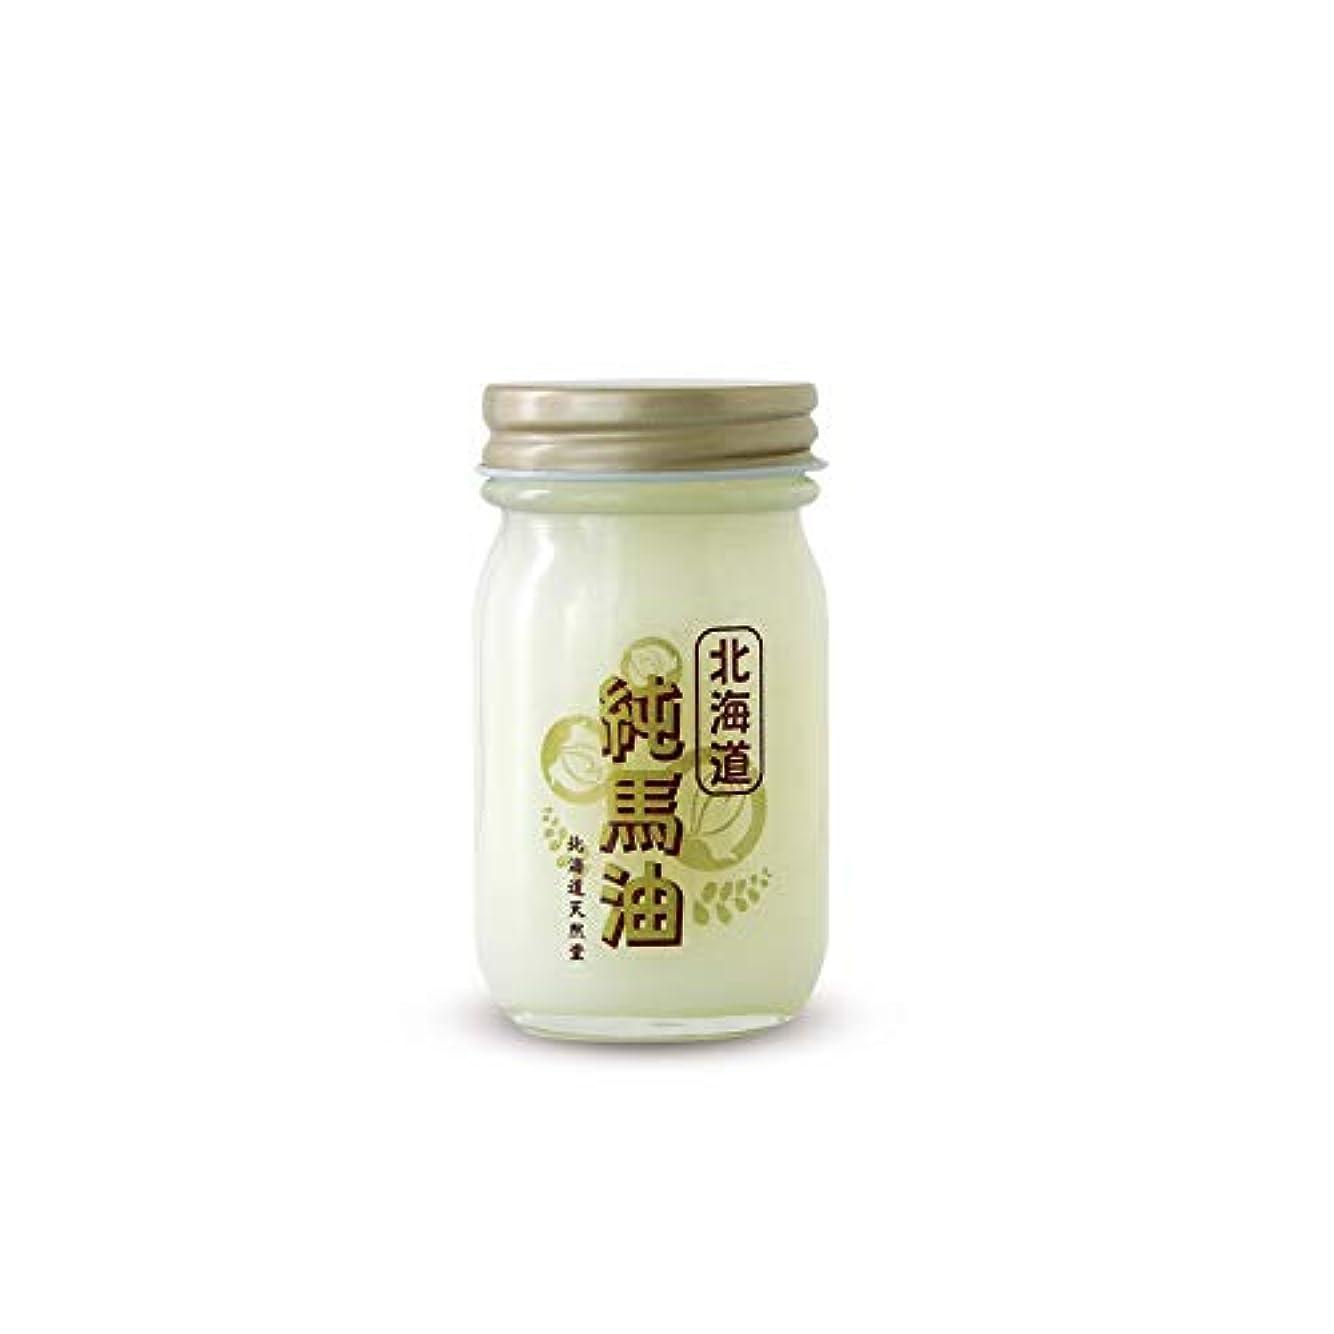 資産接ぎ木仕える純馬油 70ml 【国内限定】/ 北海道天然堂